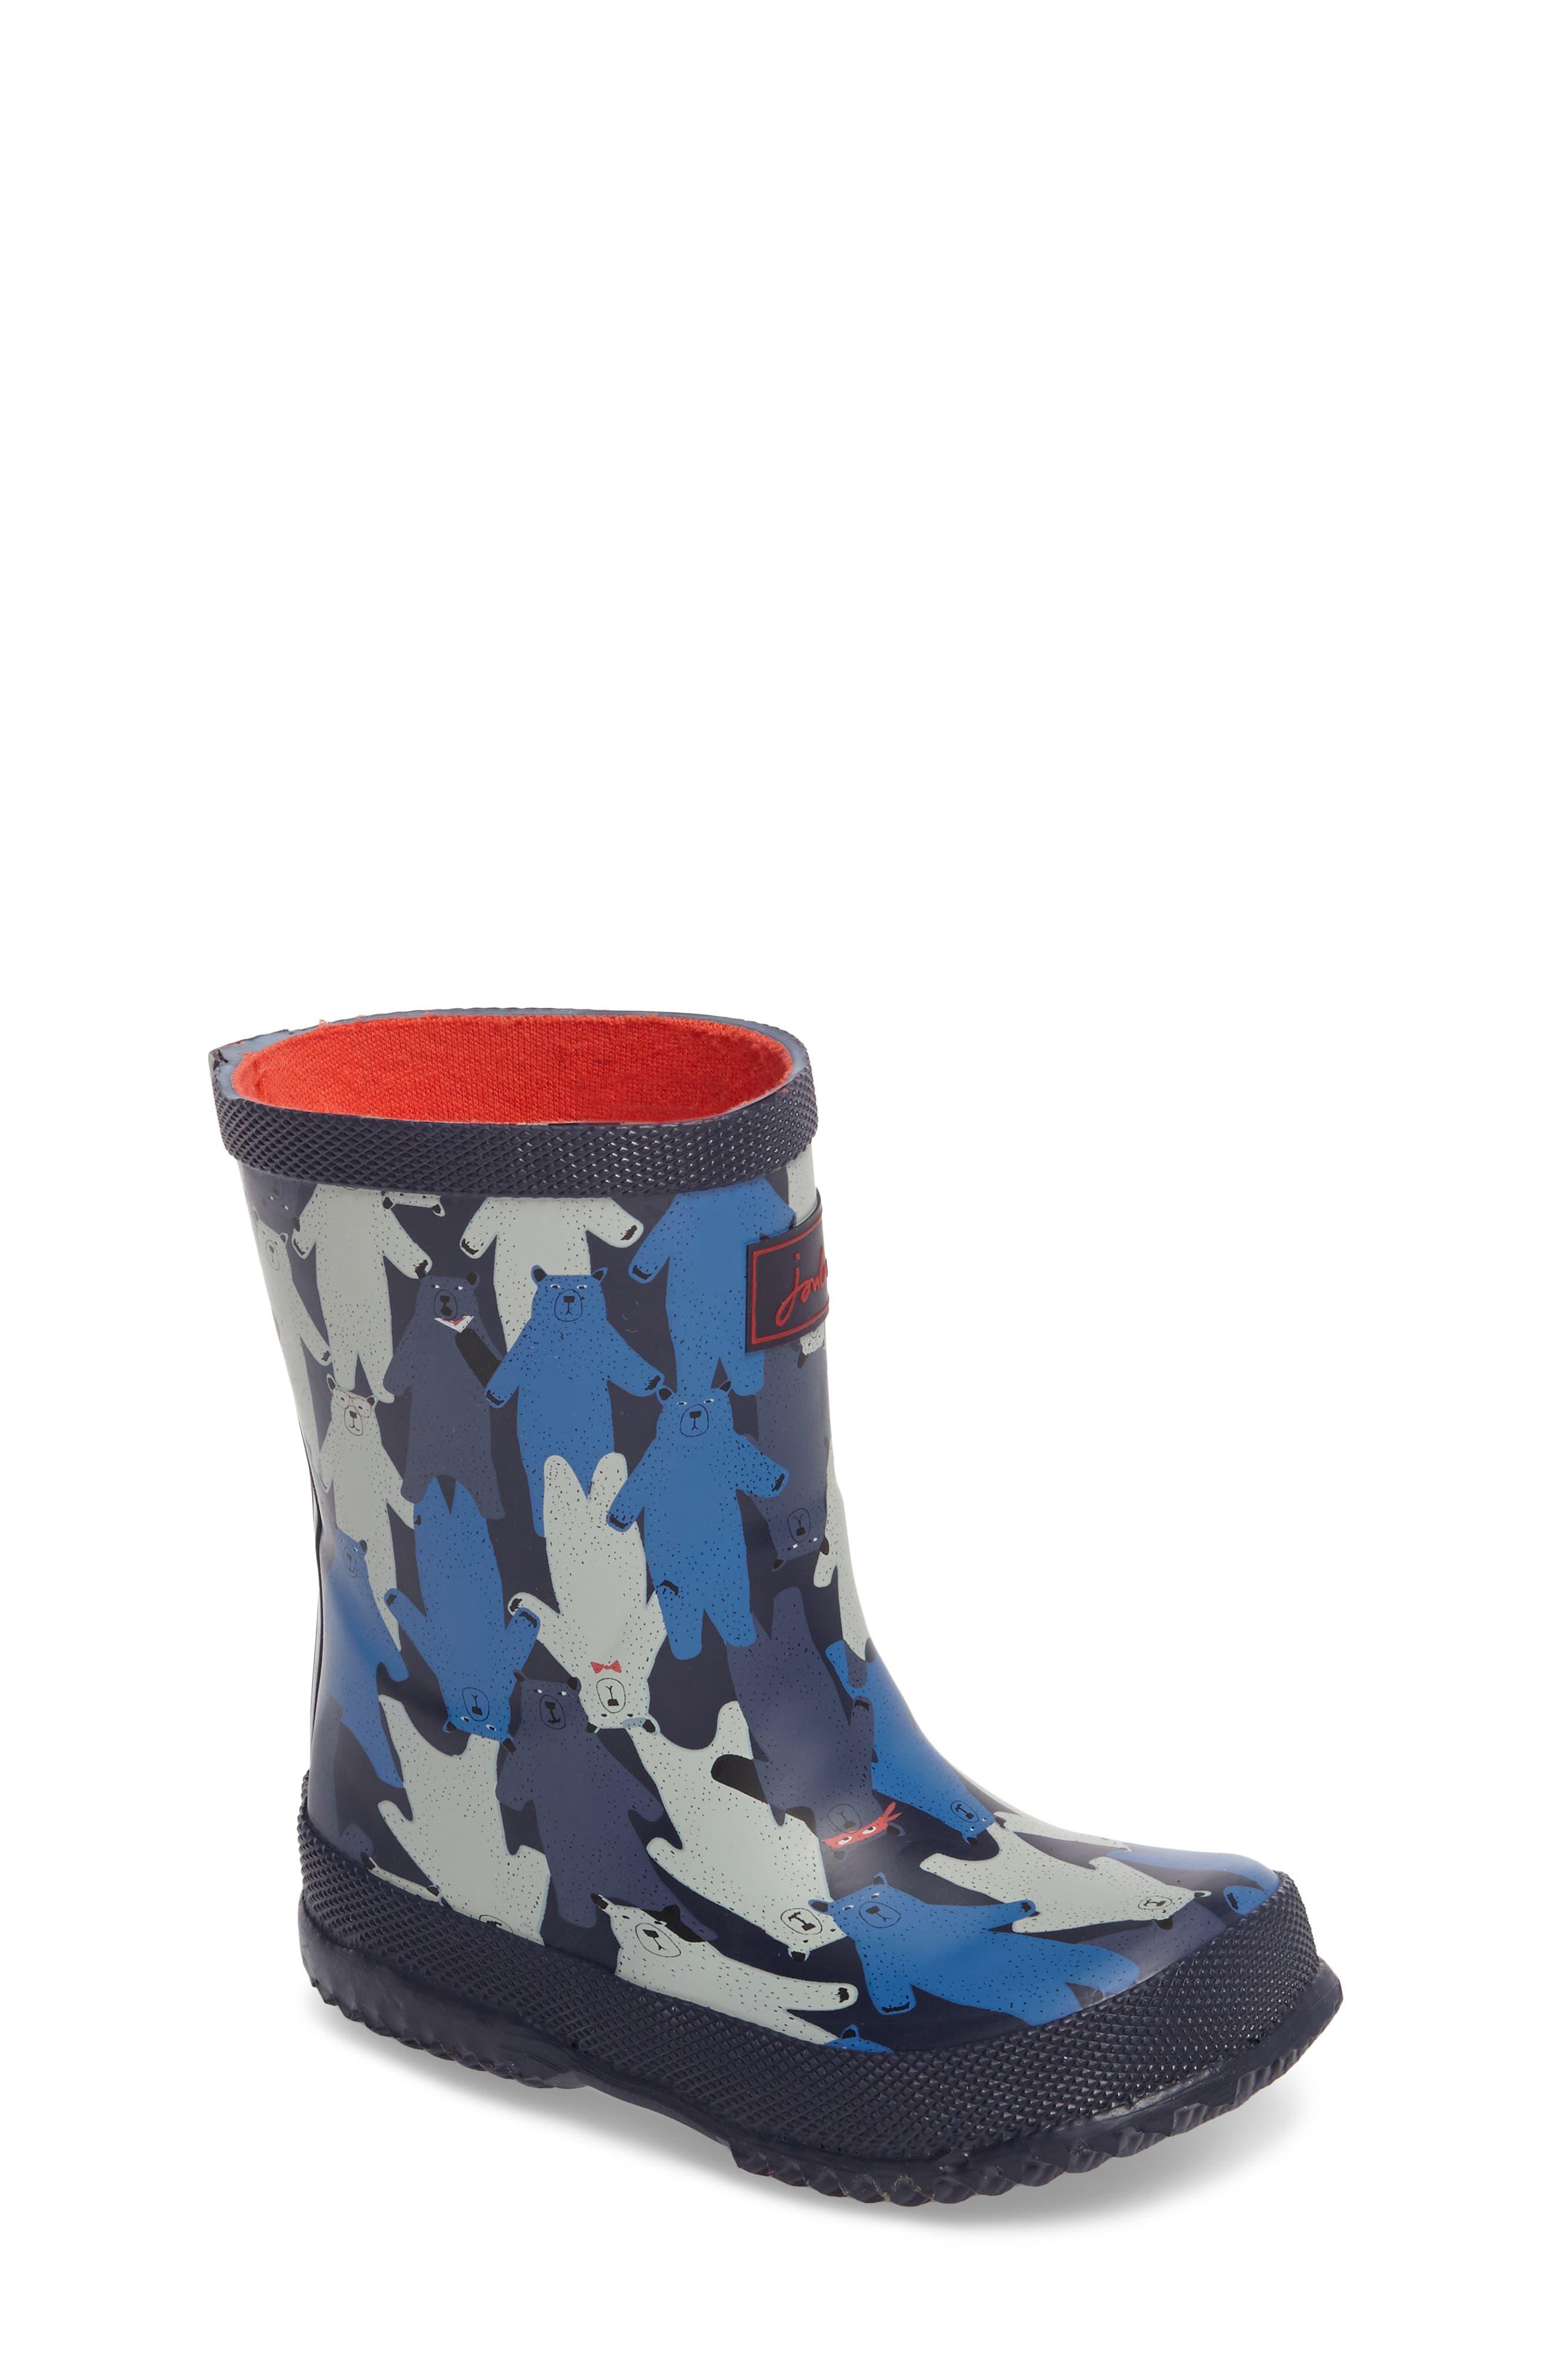 Printed Waterproof Rain Boot,                         Main,                         color, Multi Bear Camo